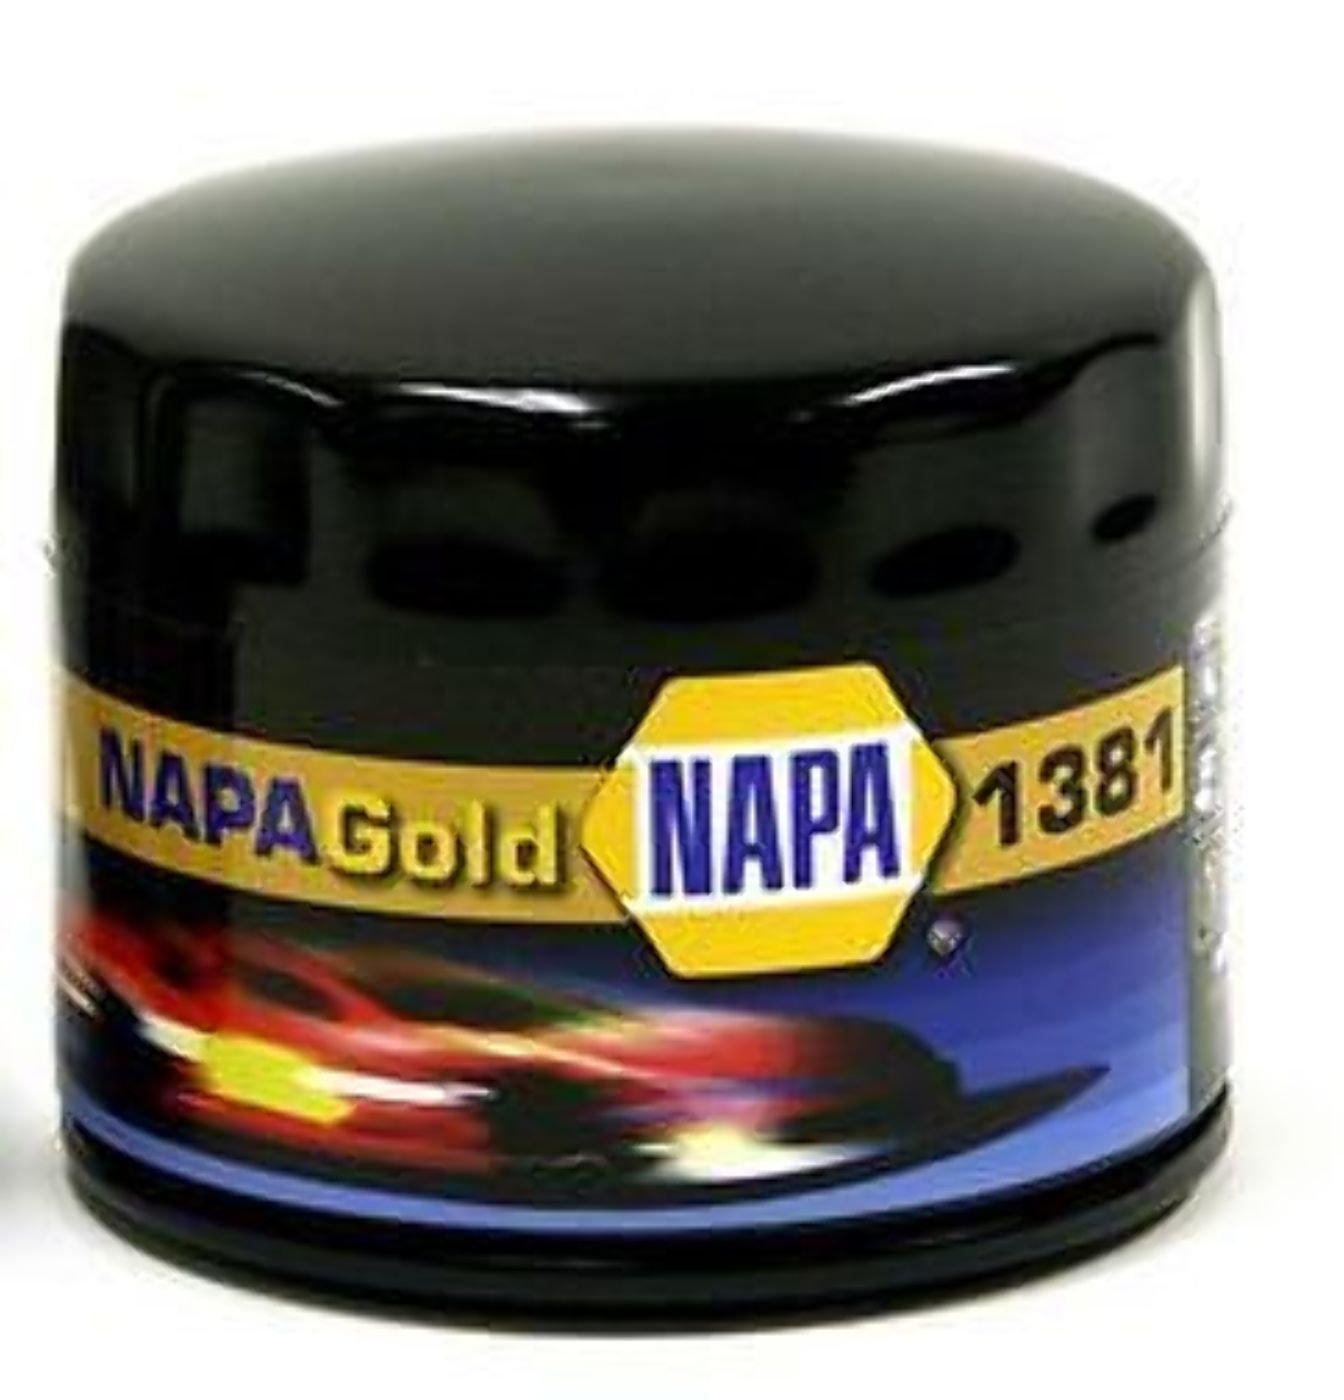 1381 NAPA Oil Filter